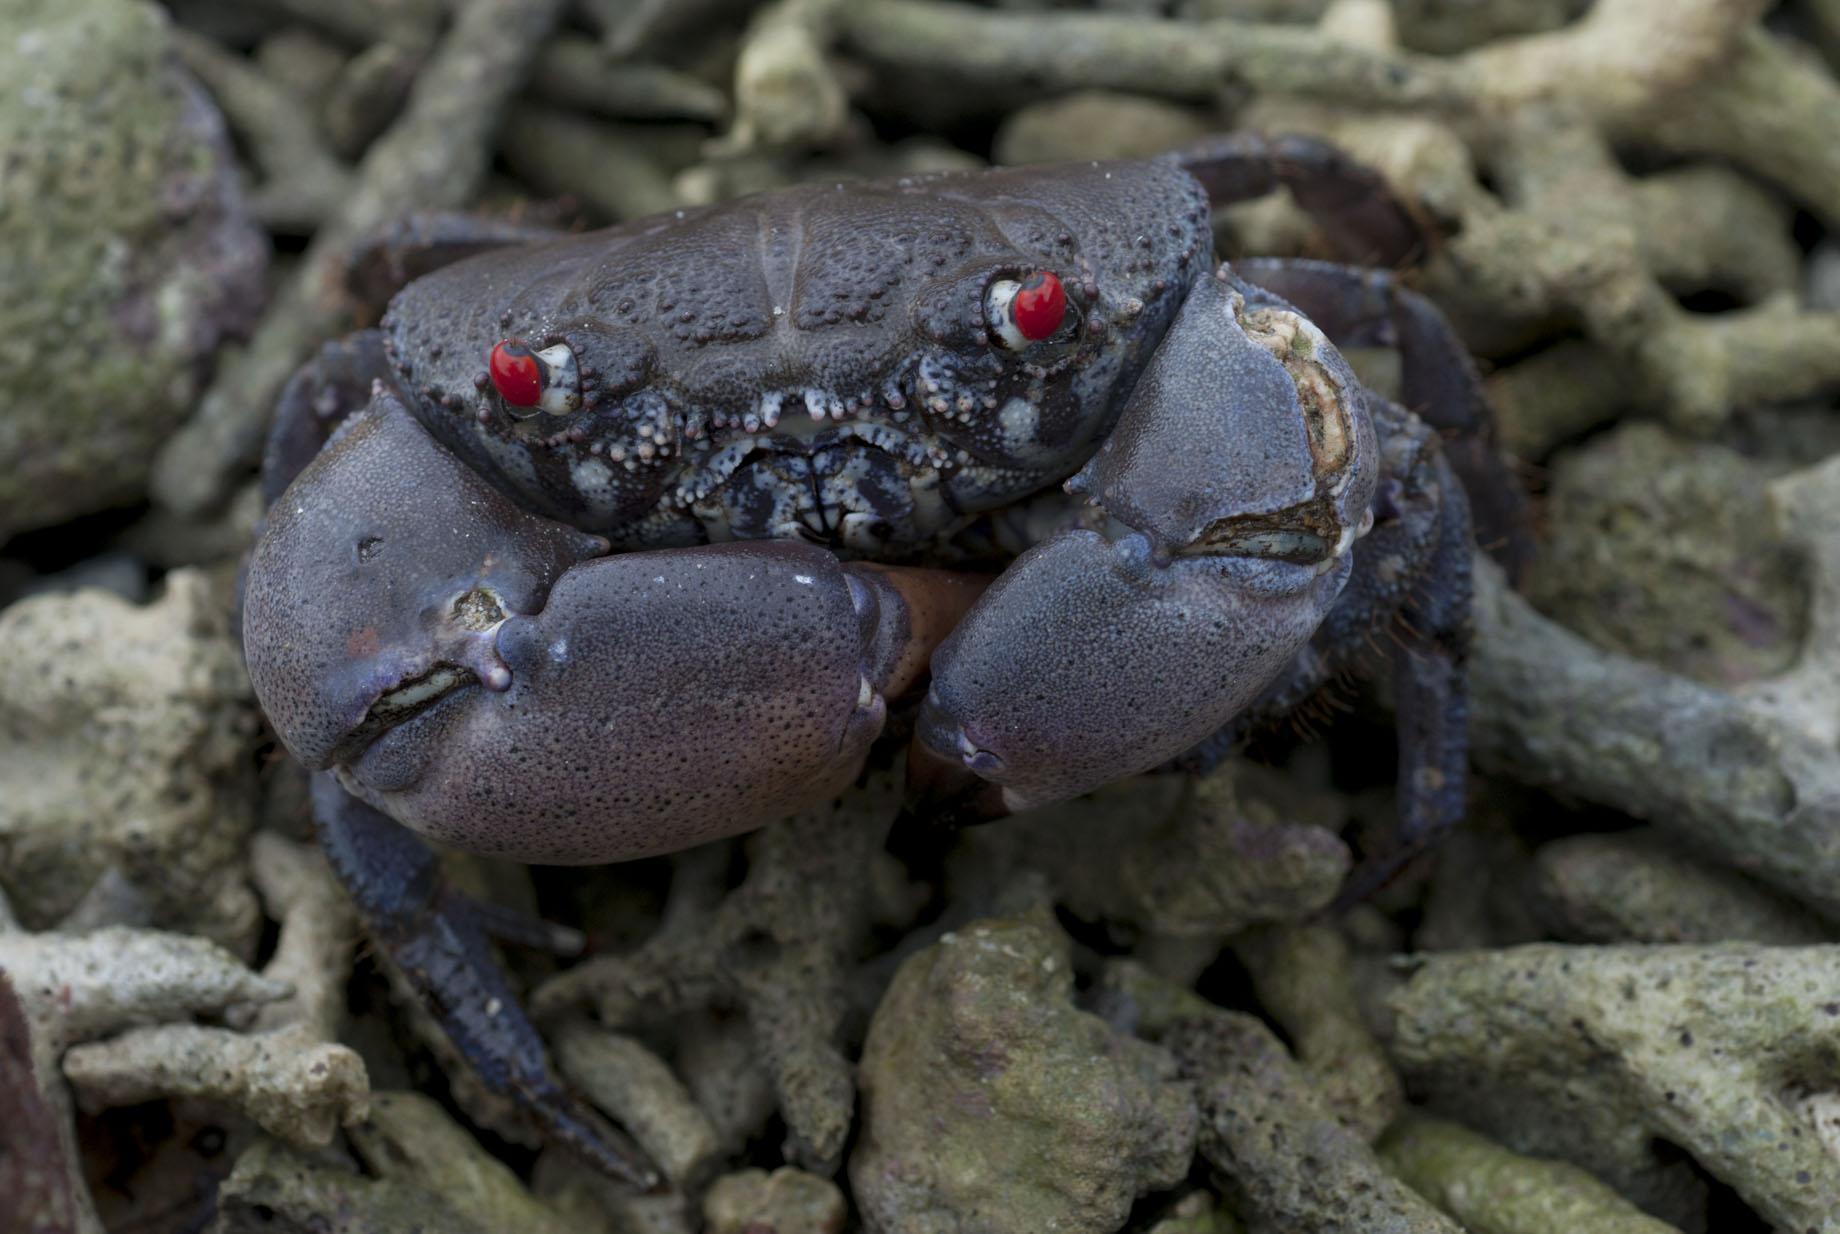 crab_20110729_Turtle_Bay_Santo_Vanuatu_1.jpg